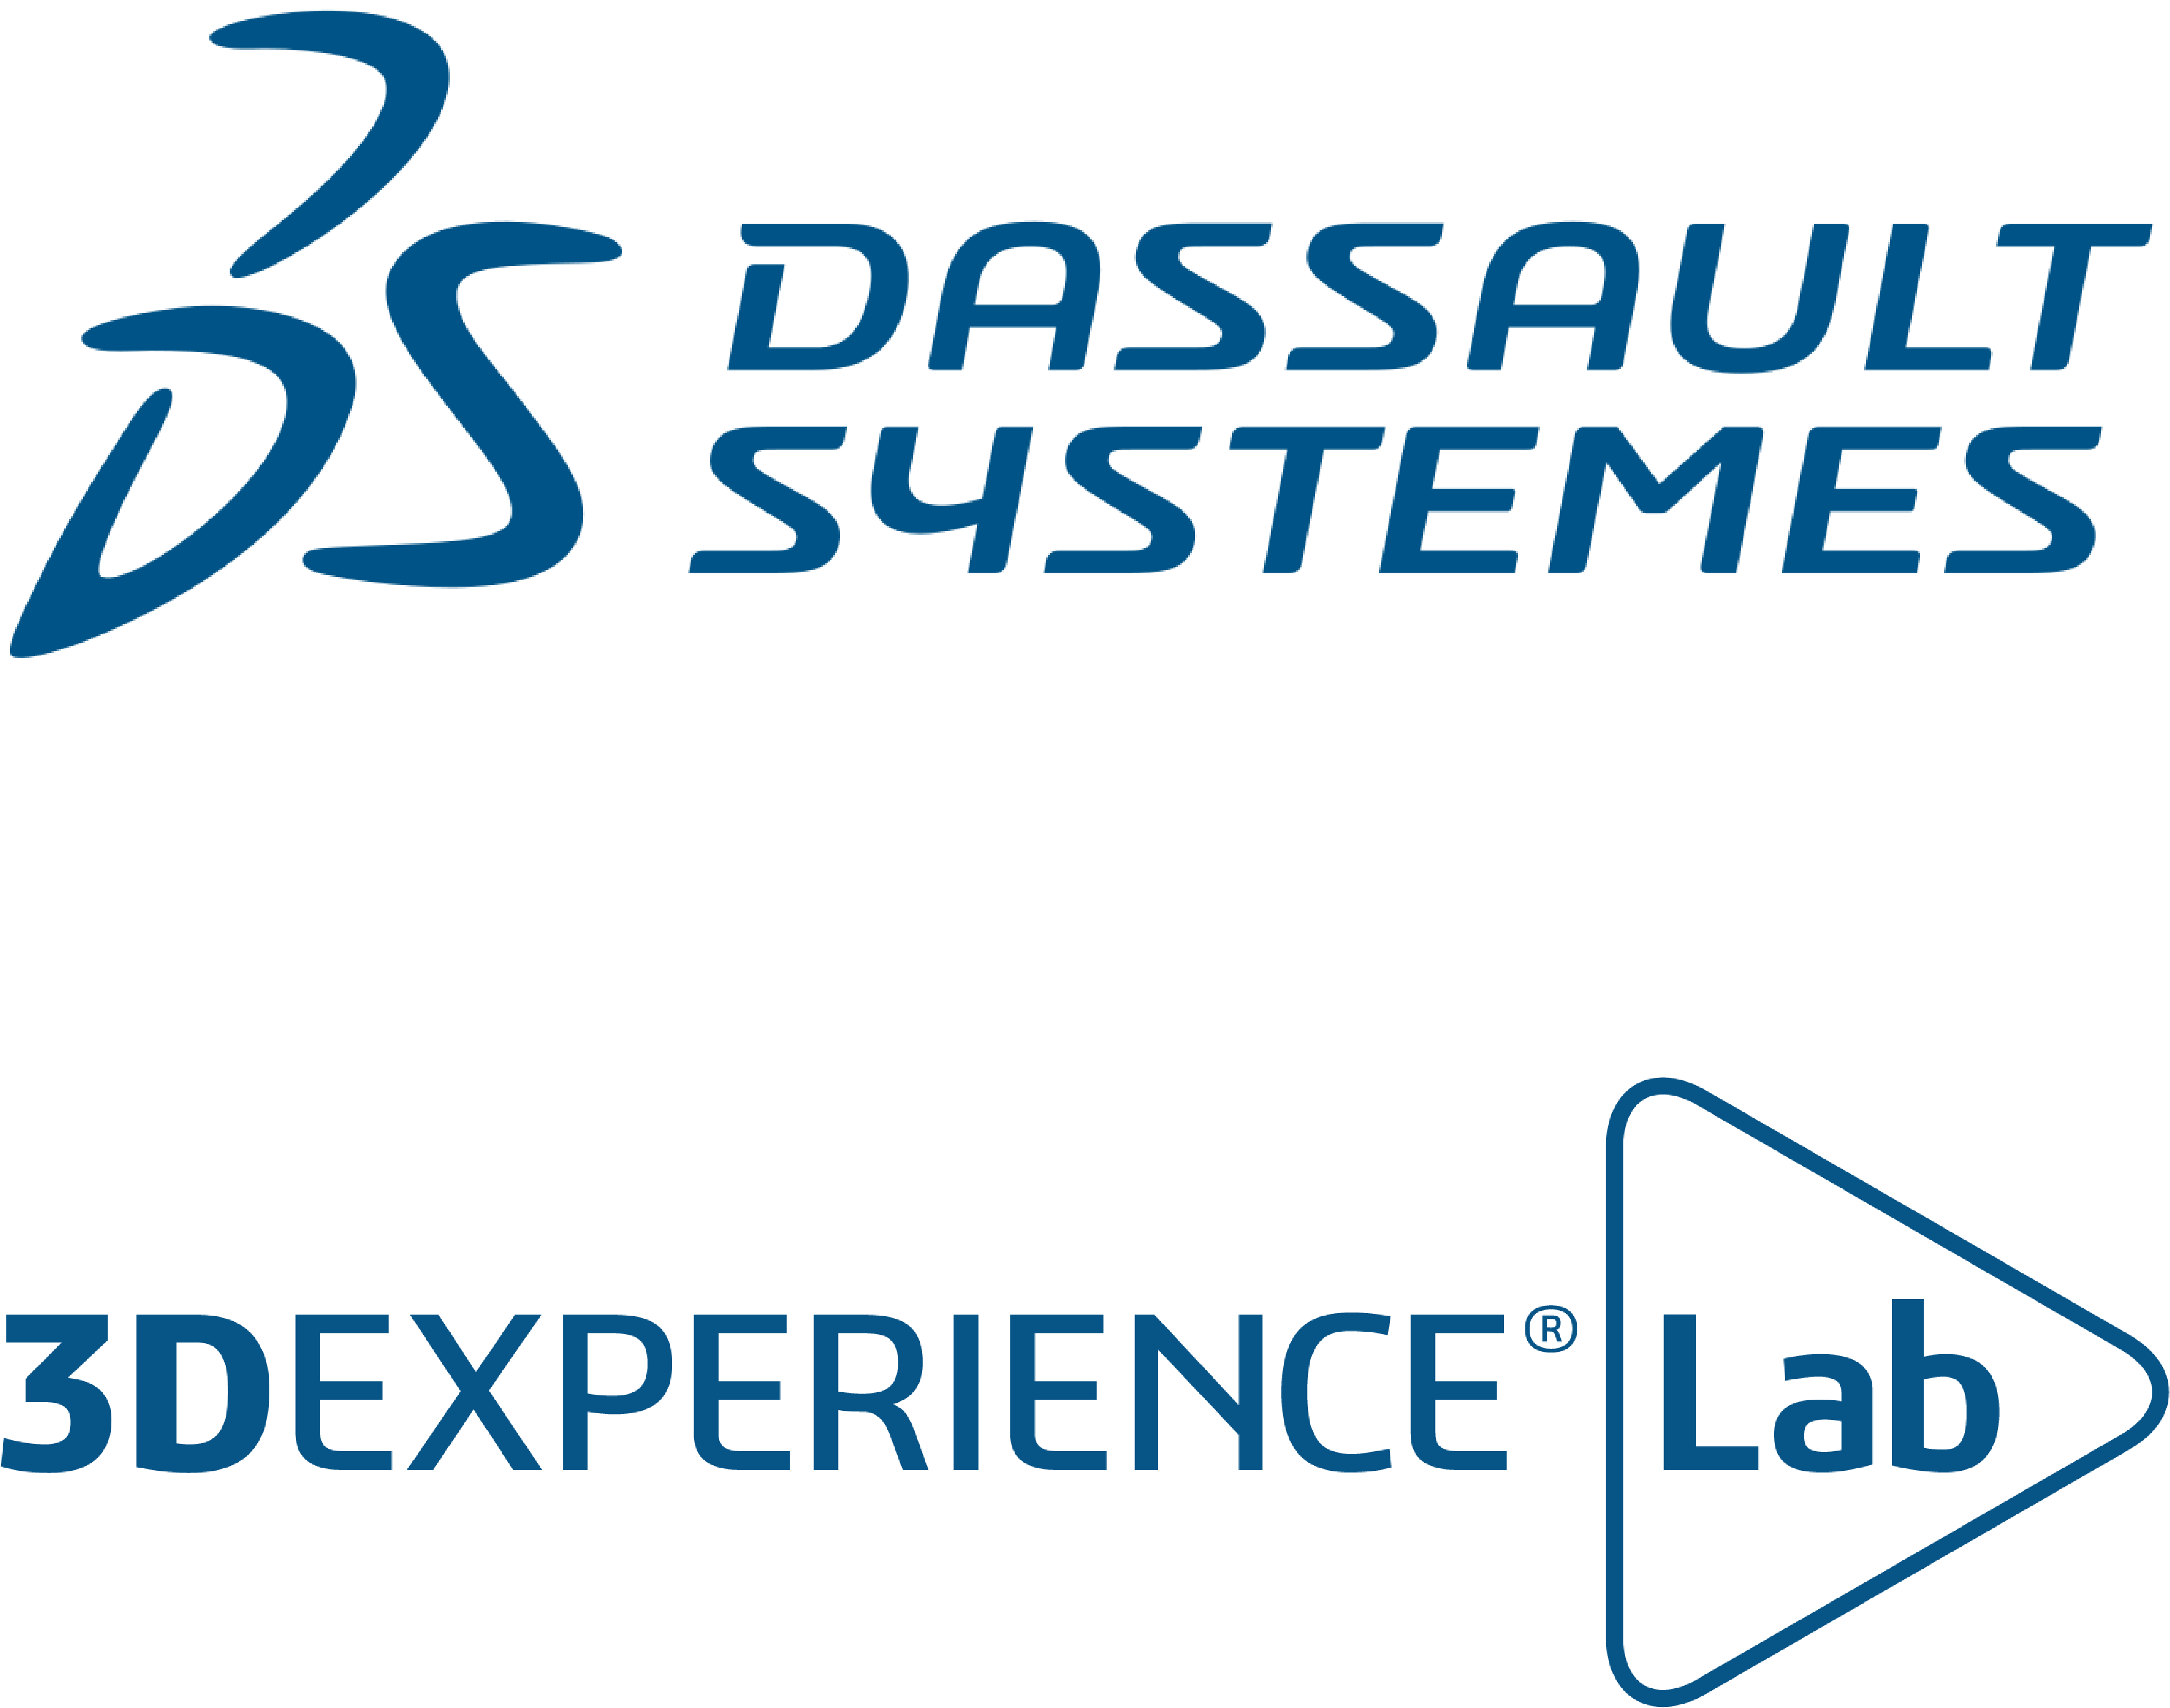 DASSAULT SYSTEMES 3DEXPERIENCE Lab